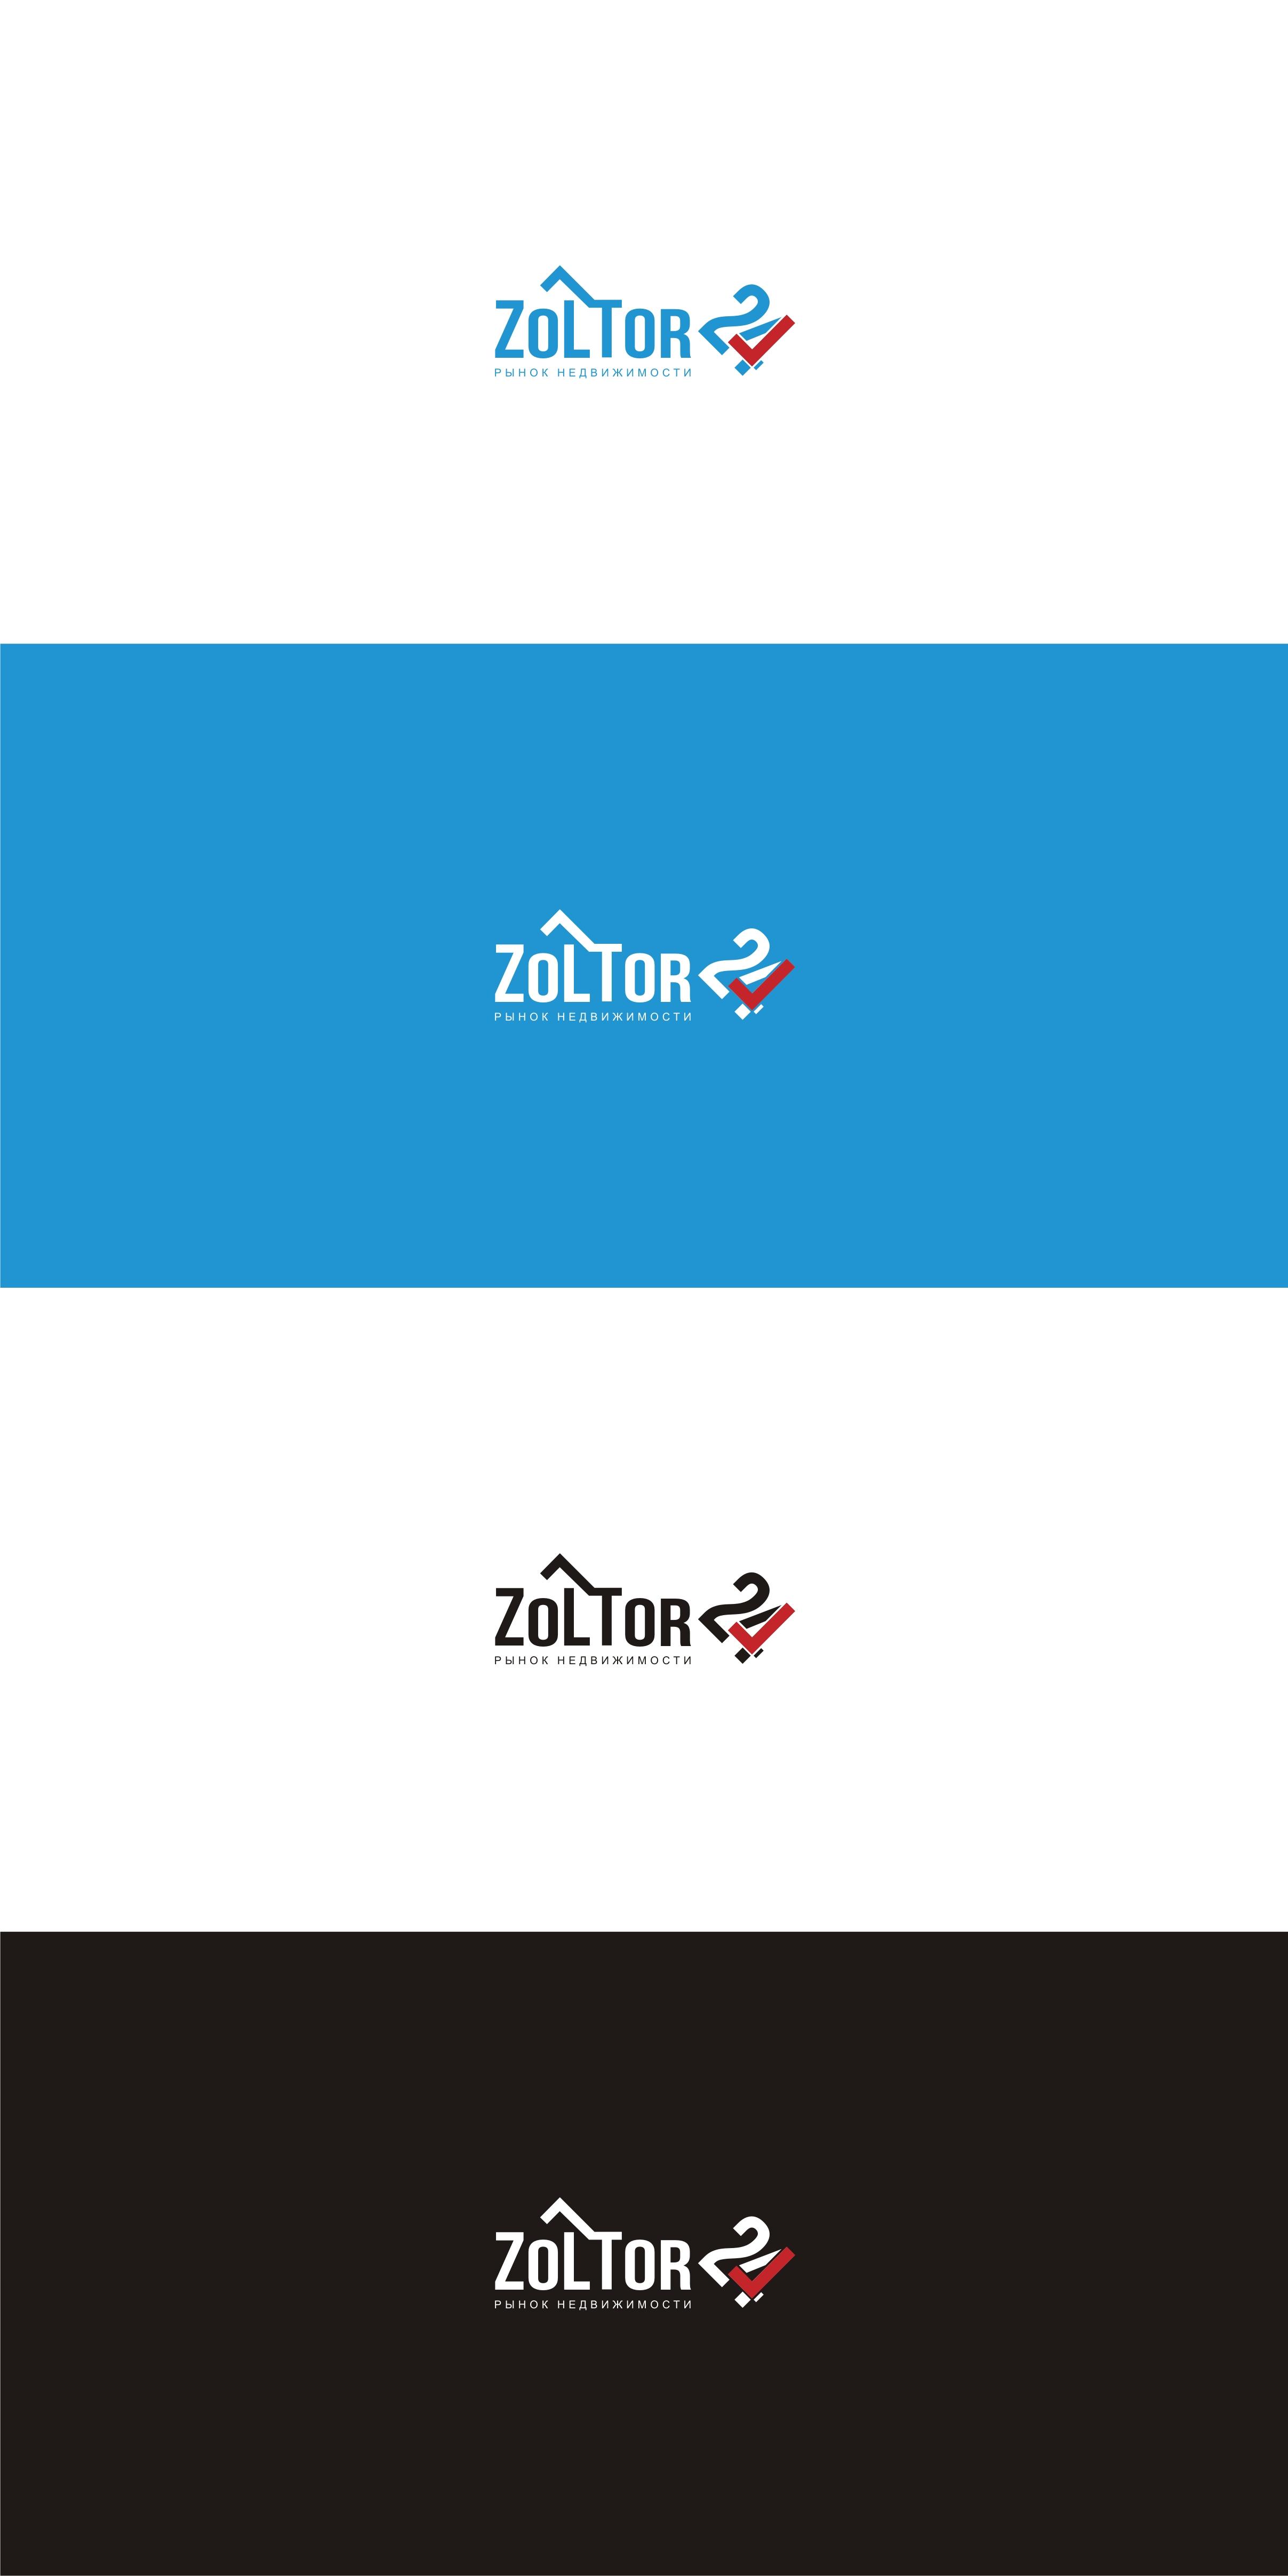 Логотип и фирменный стиль ZolTor24 фото f_5425c90cf4daac42.jpg